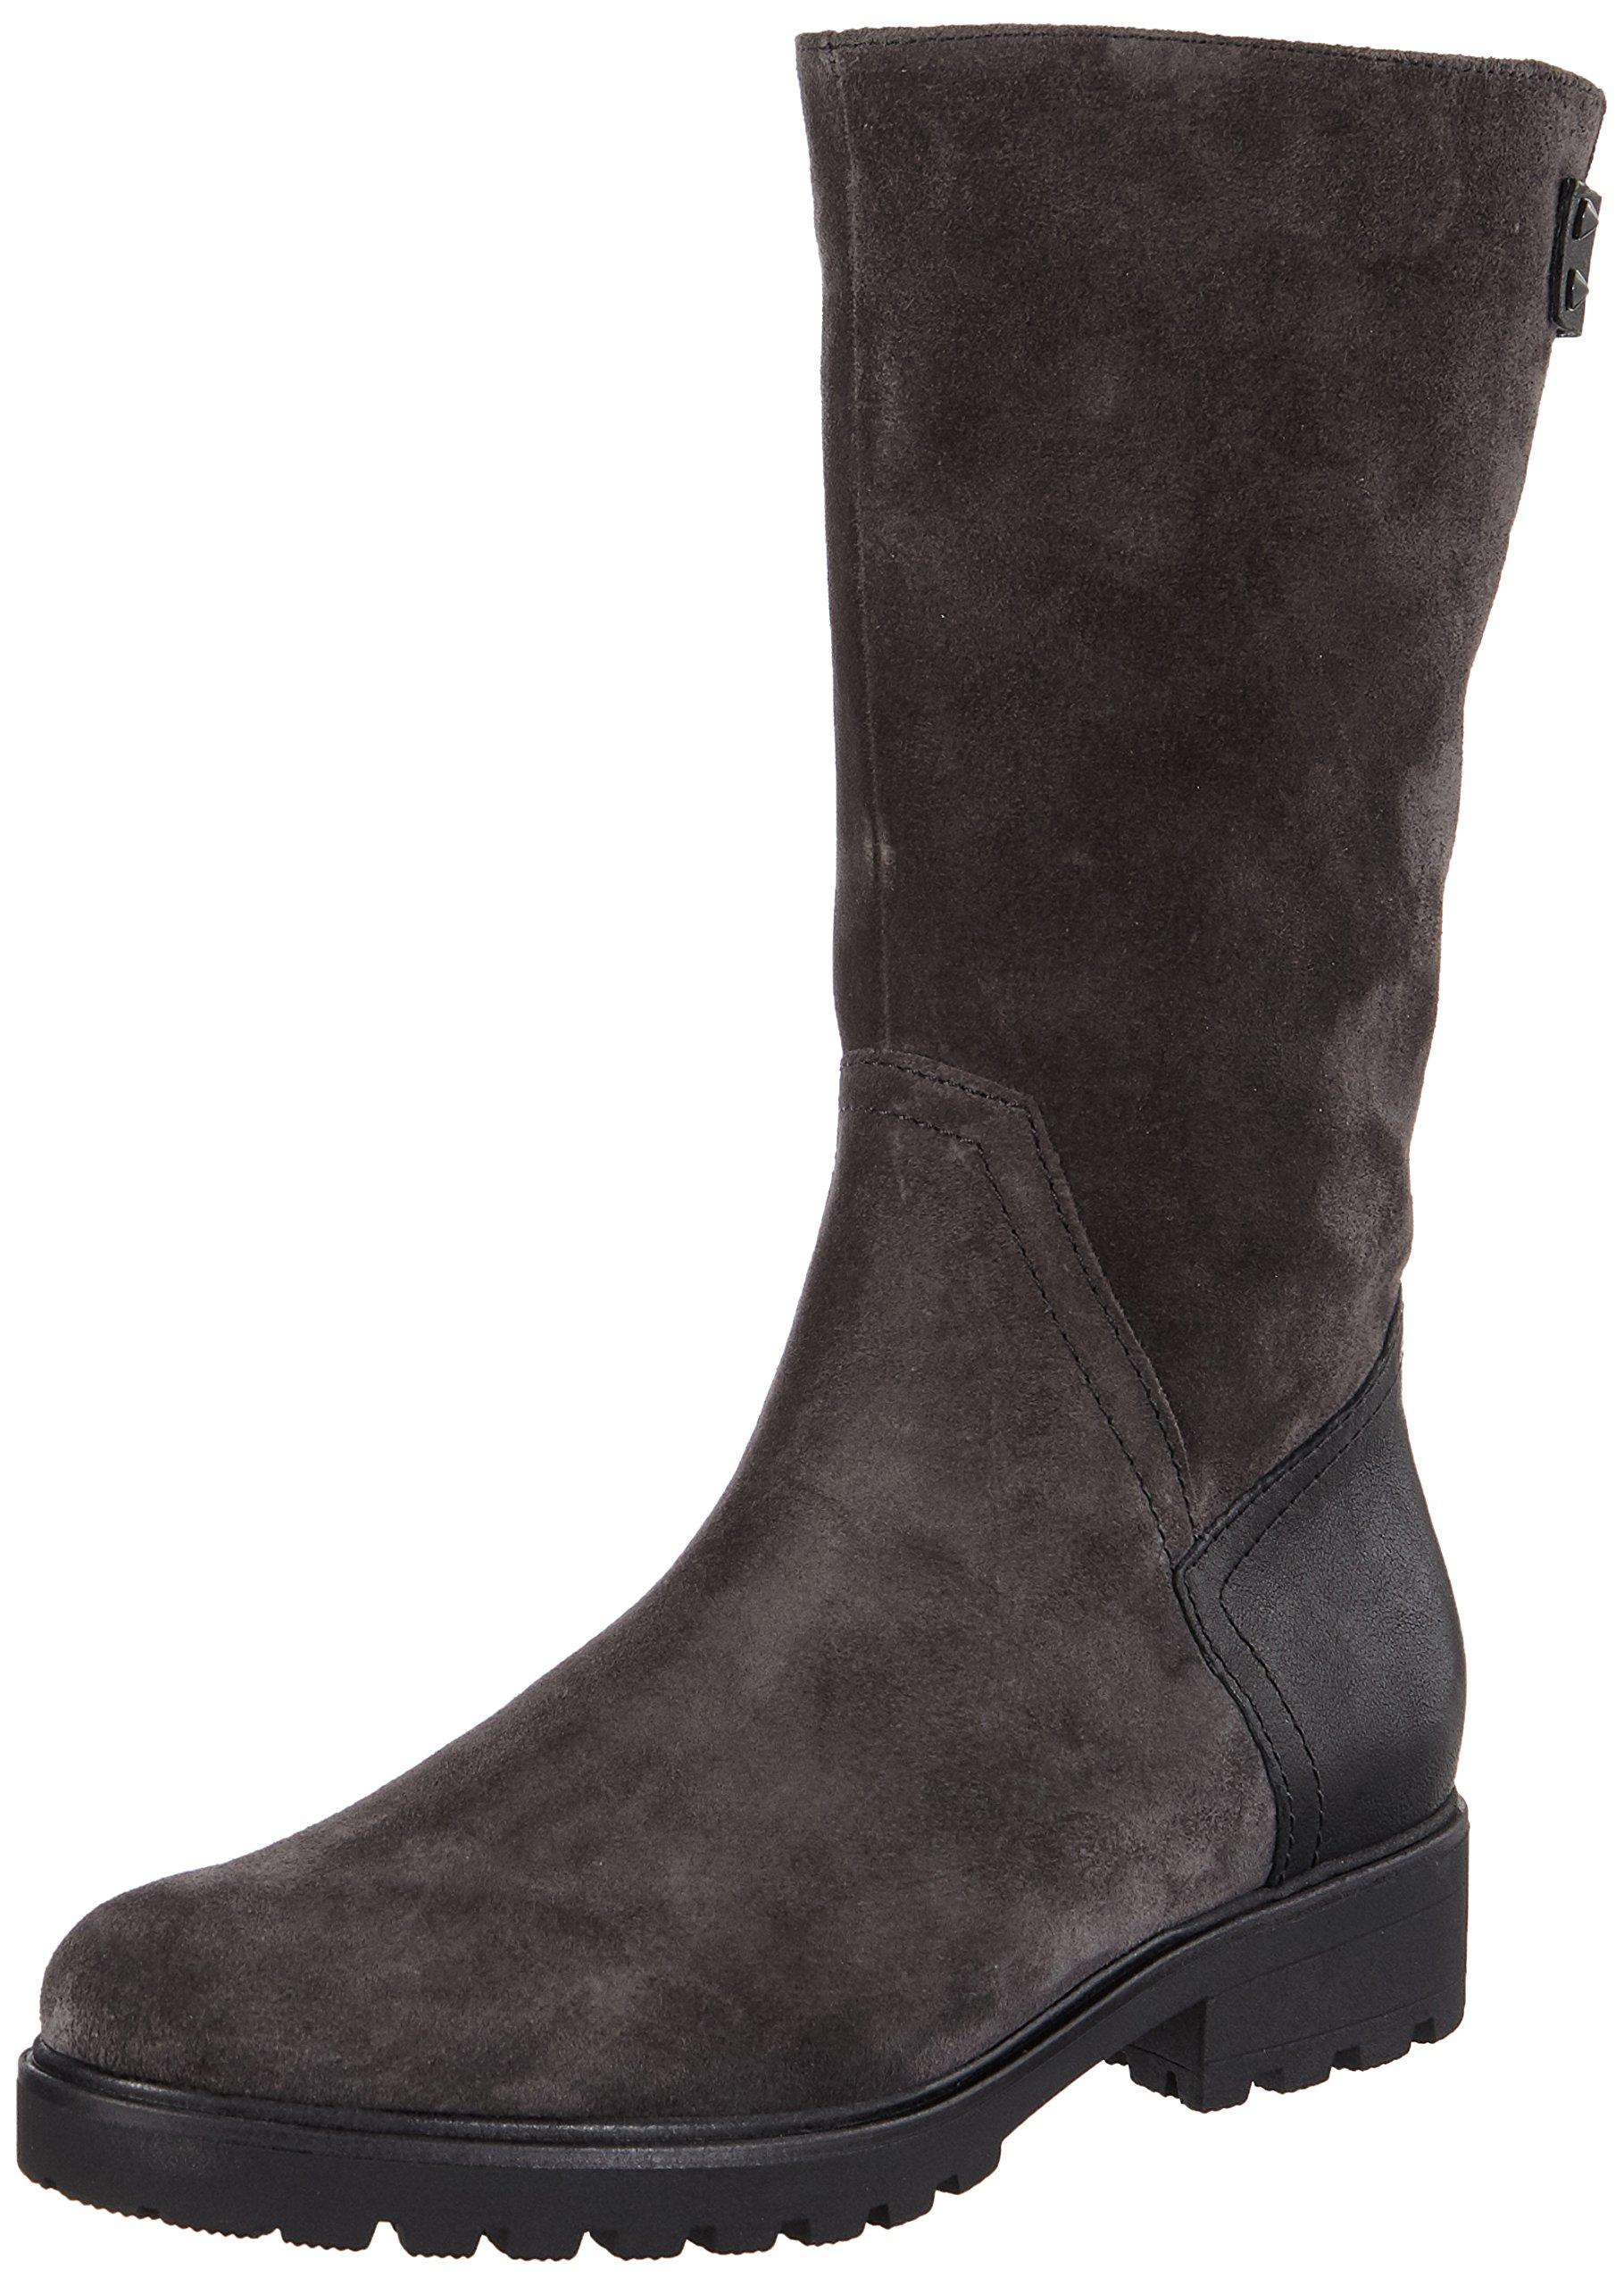 FemmeGrisdk Comfort SportBottes schwmel42 grey Gabor Eu Shoes FKc13TJl